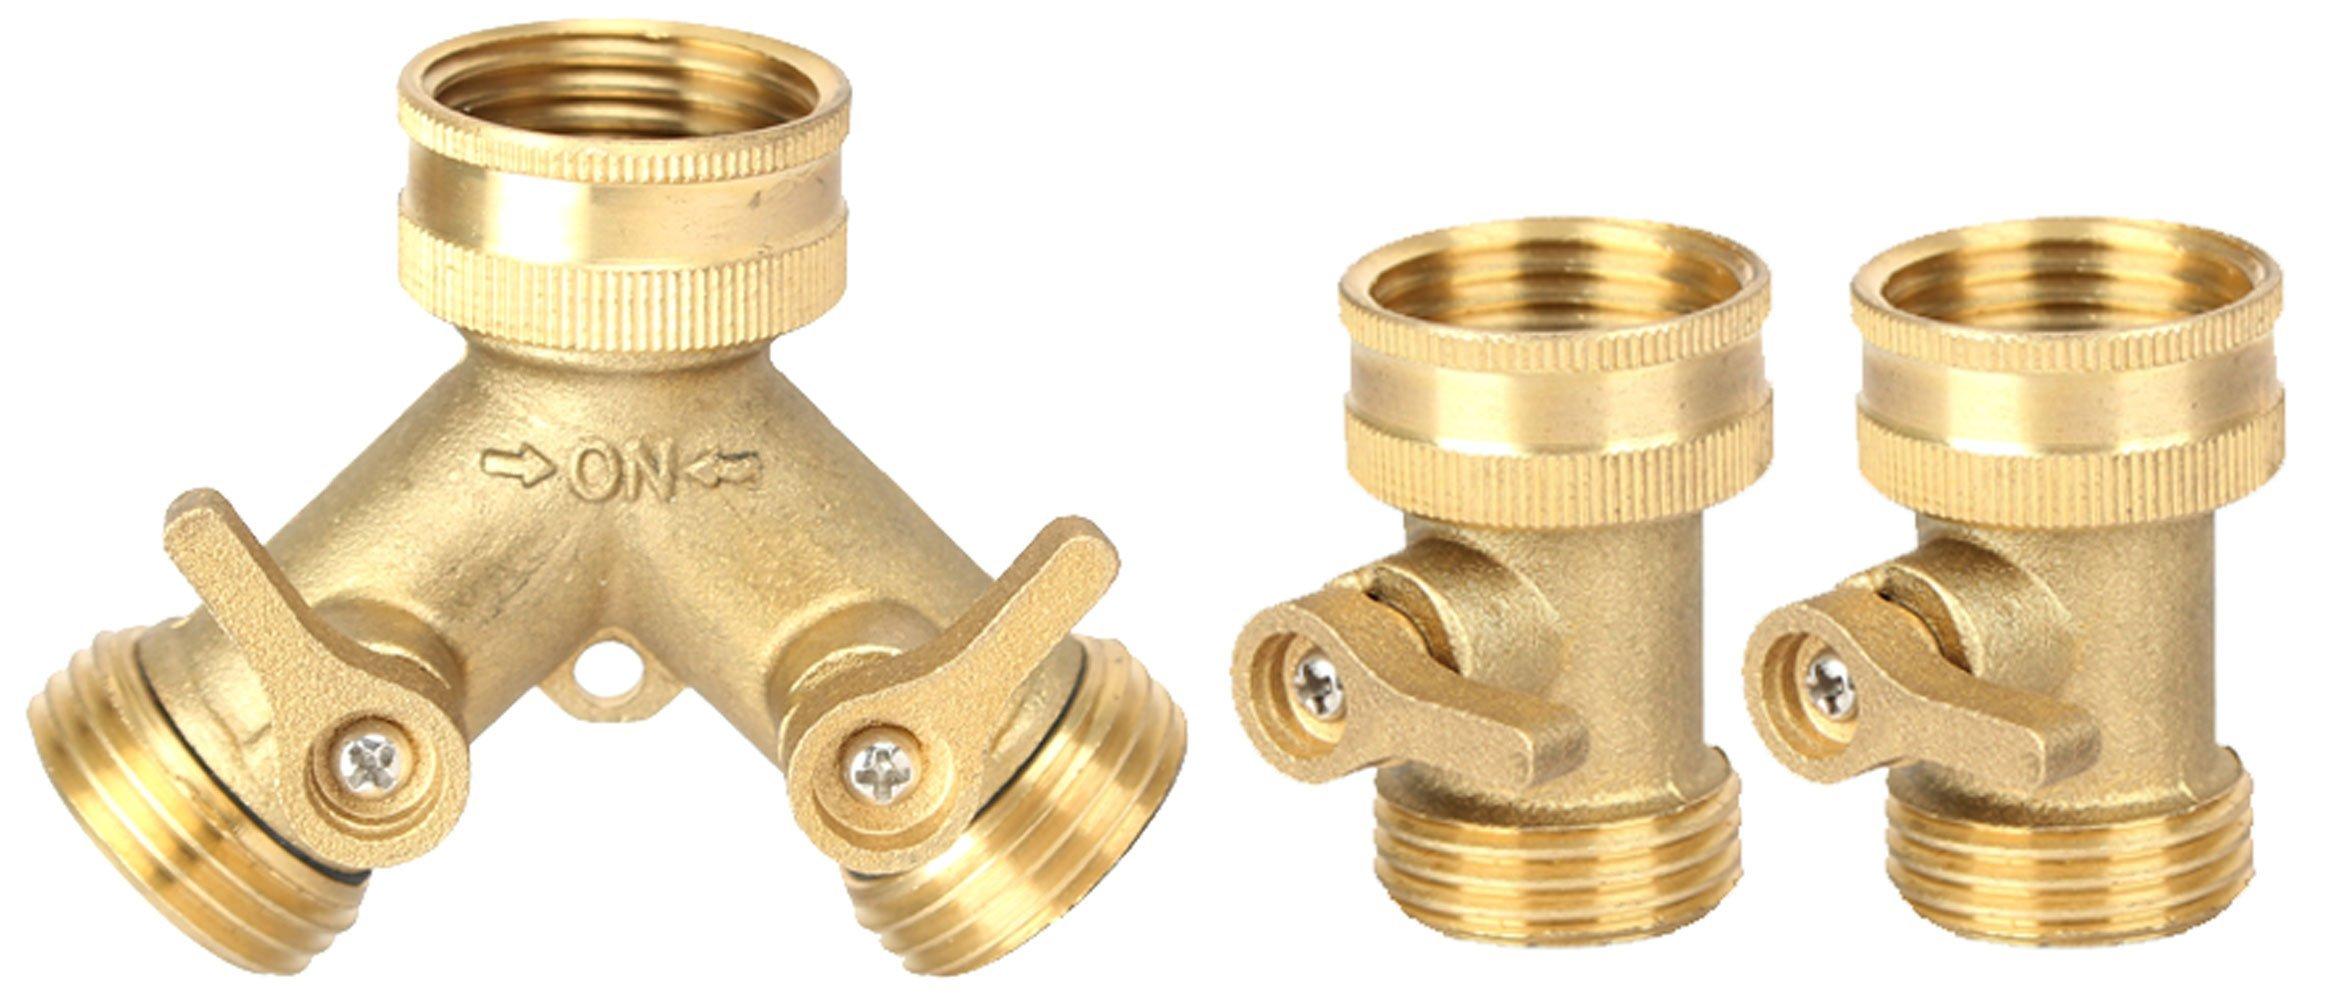 Harmony Lead Free-Garden Hose Connector (Brass Hose Splitter Shut-Off Set)